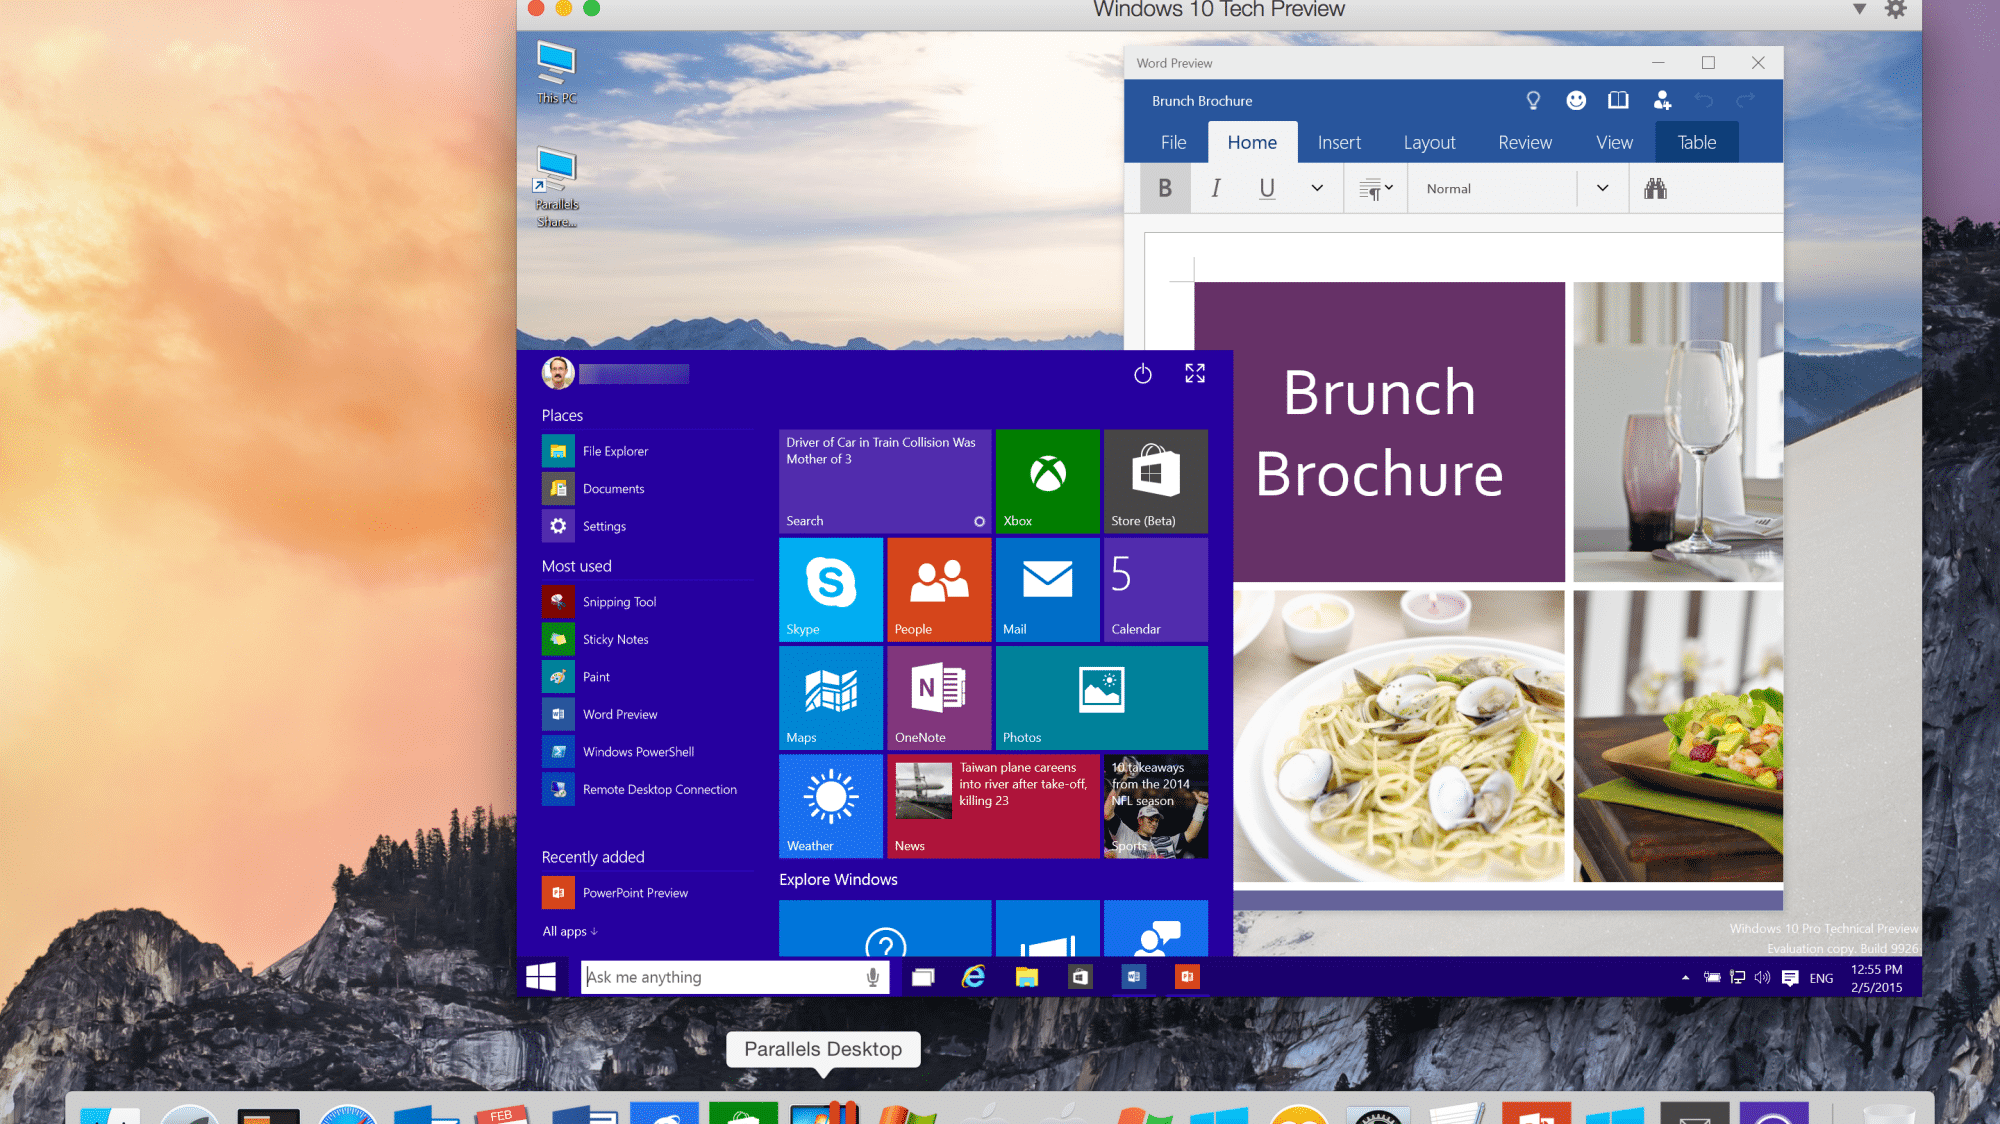 Parallels Desktop: Mac virtualisiert Windows 10